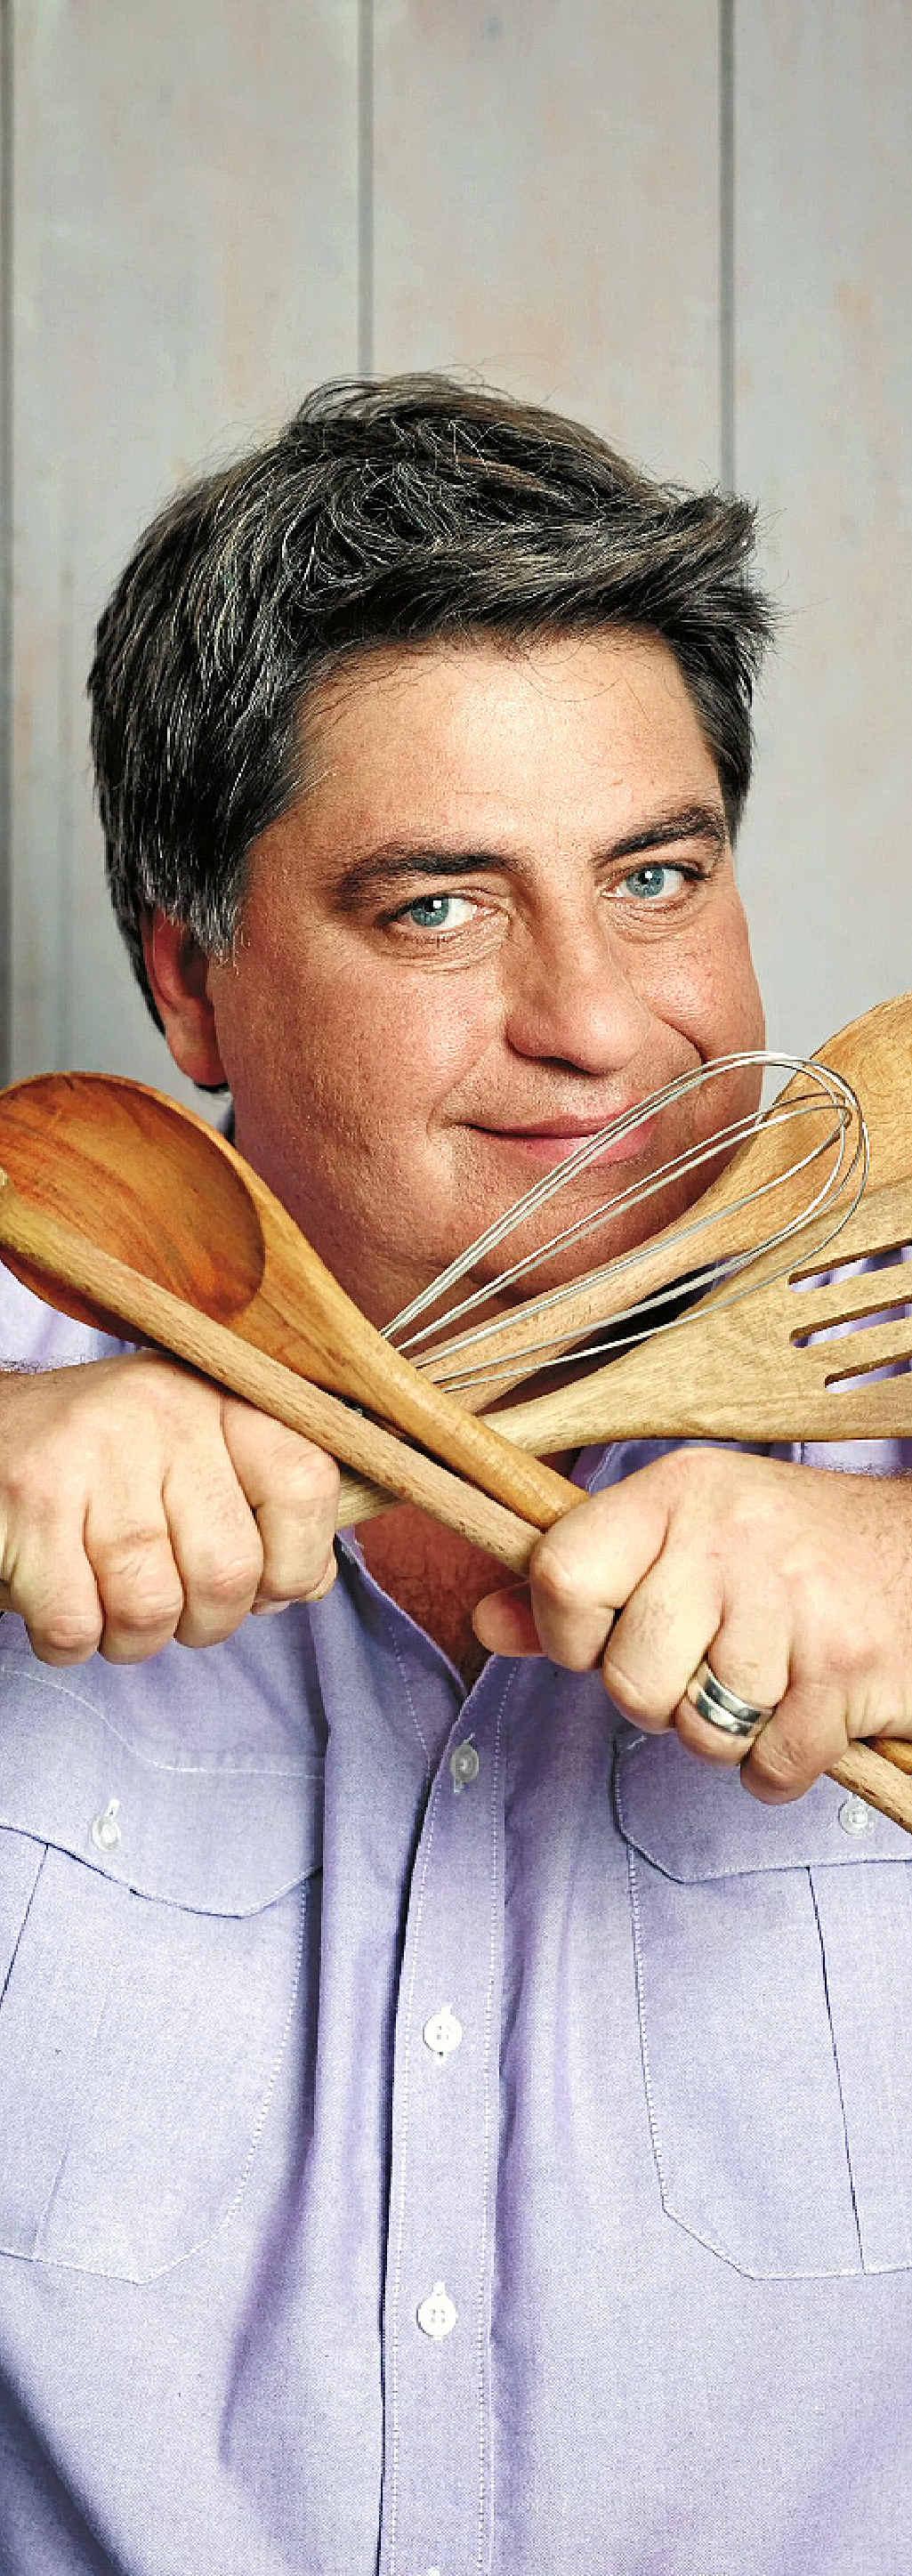 MasterChef Australia judge and food writer Matt Preston.